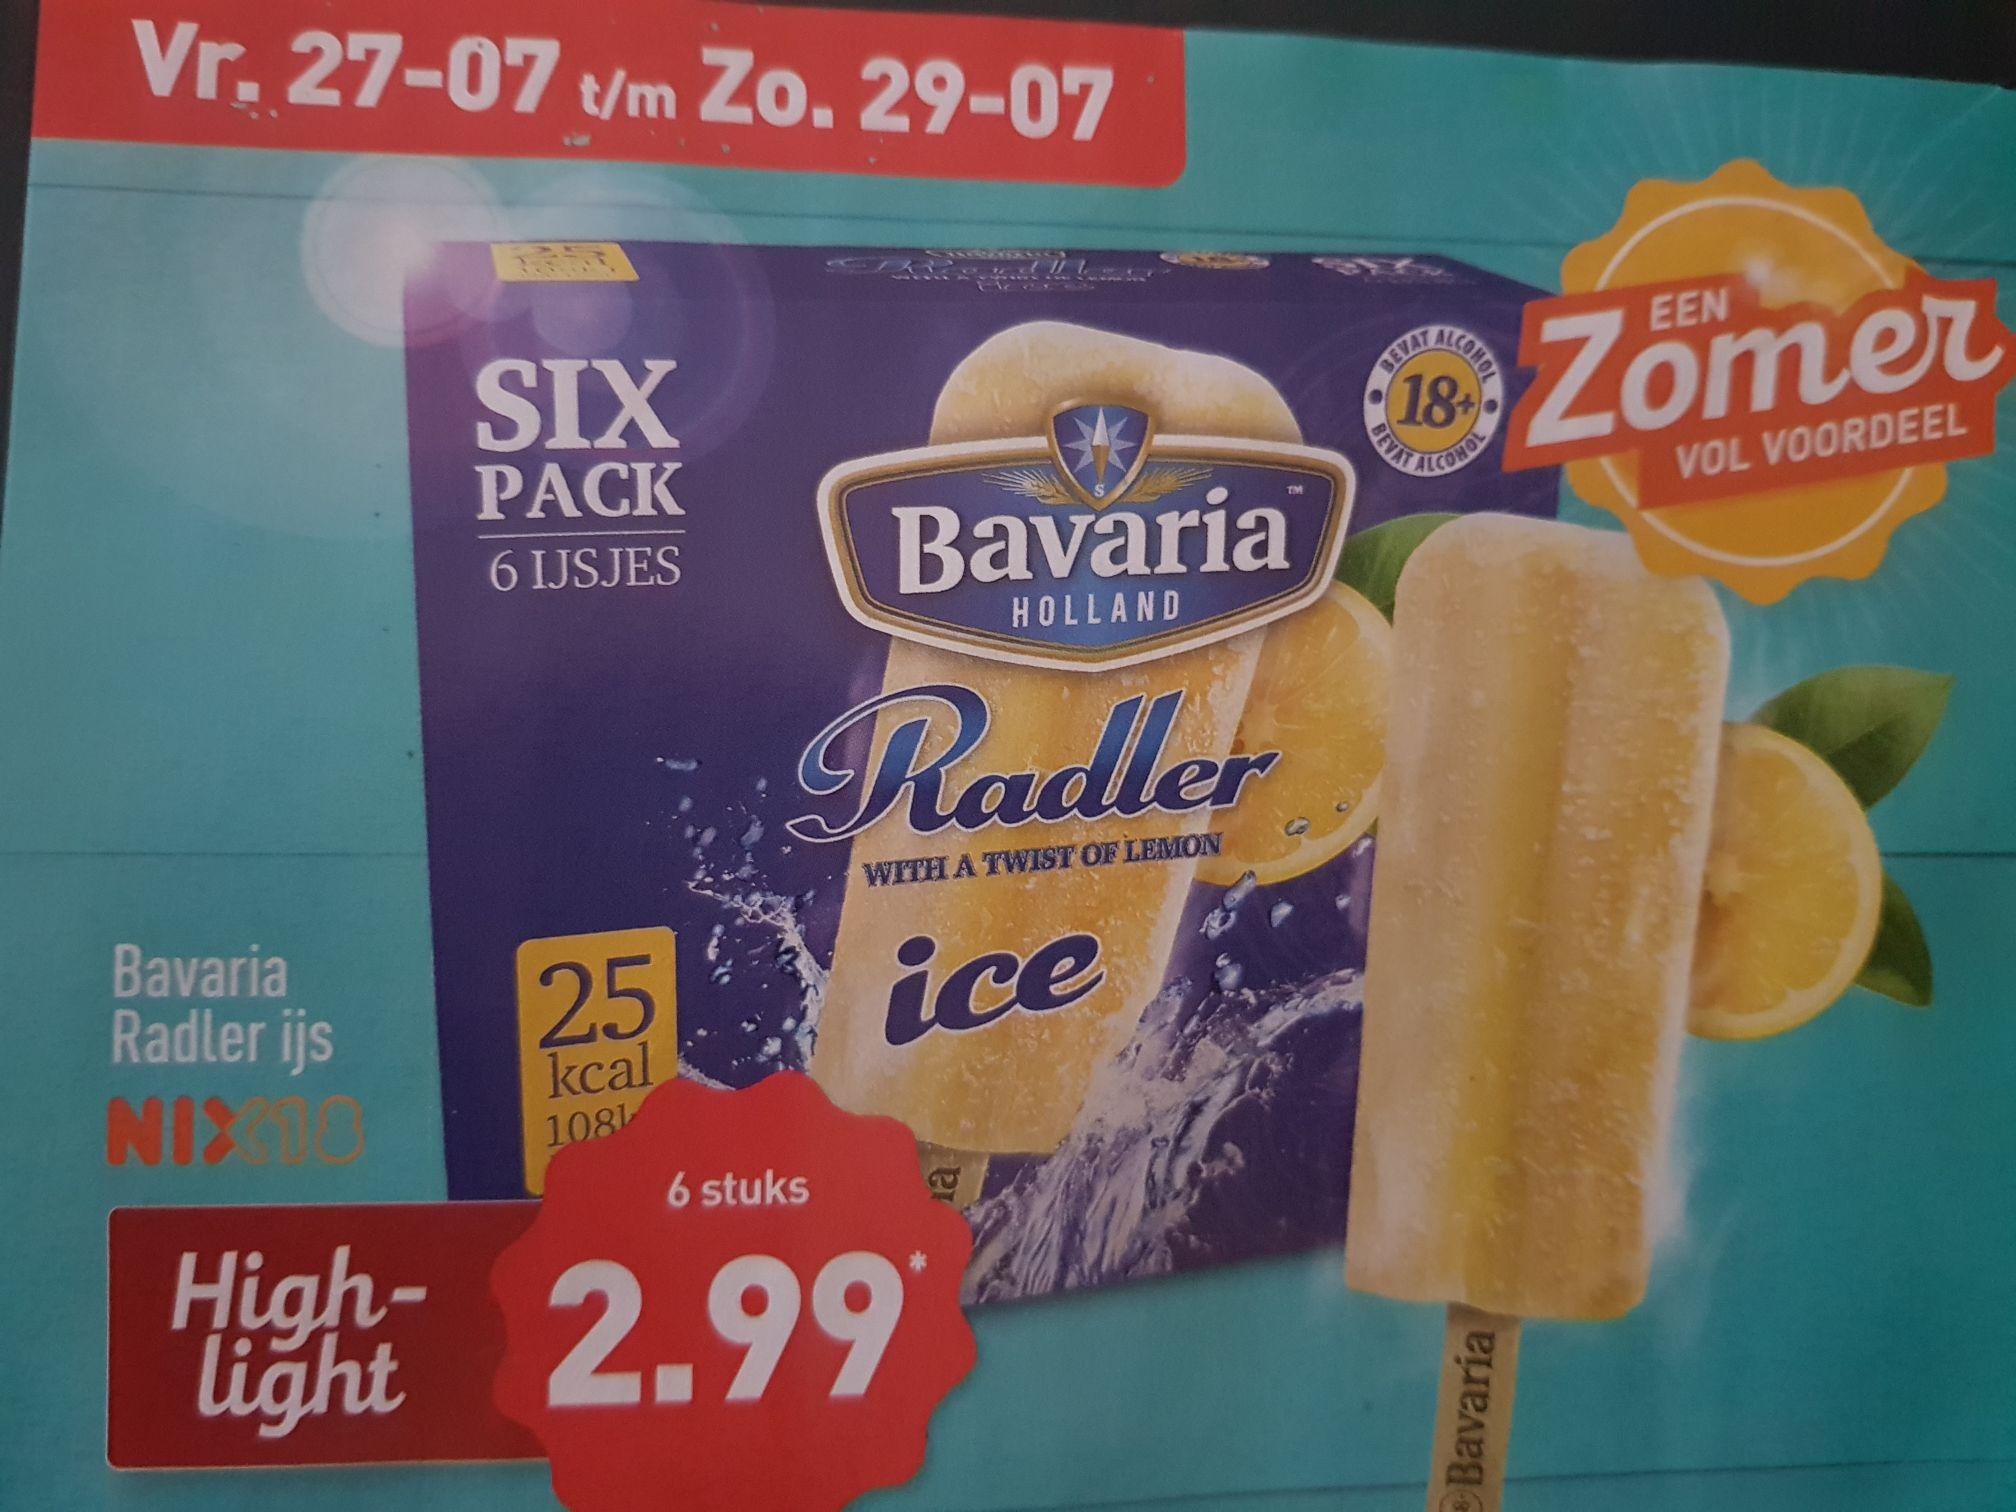 Six Pack Bavaria Radler ijs @Aldi